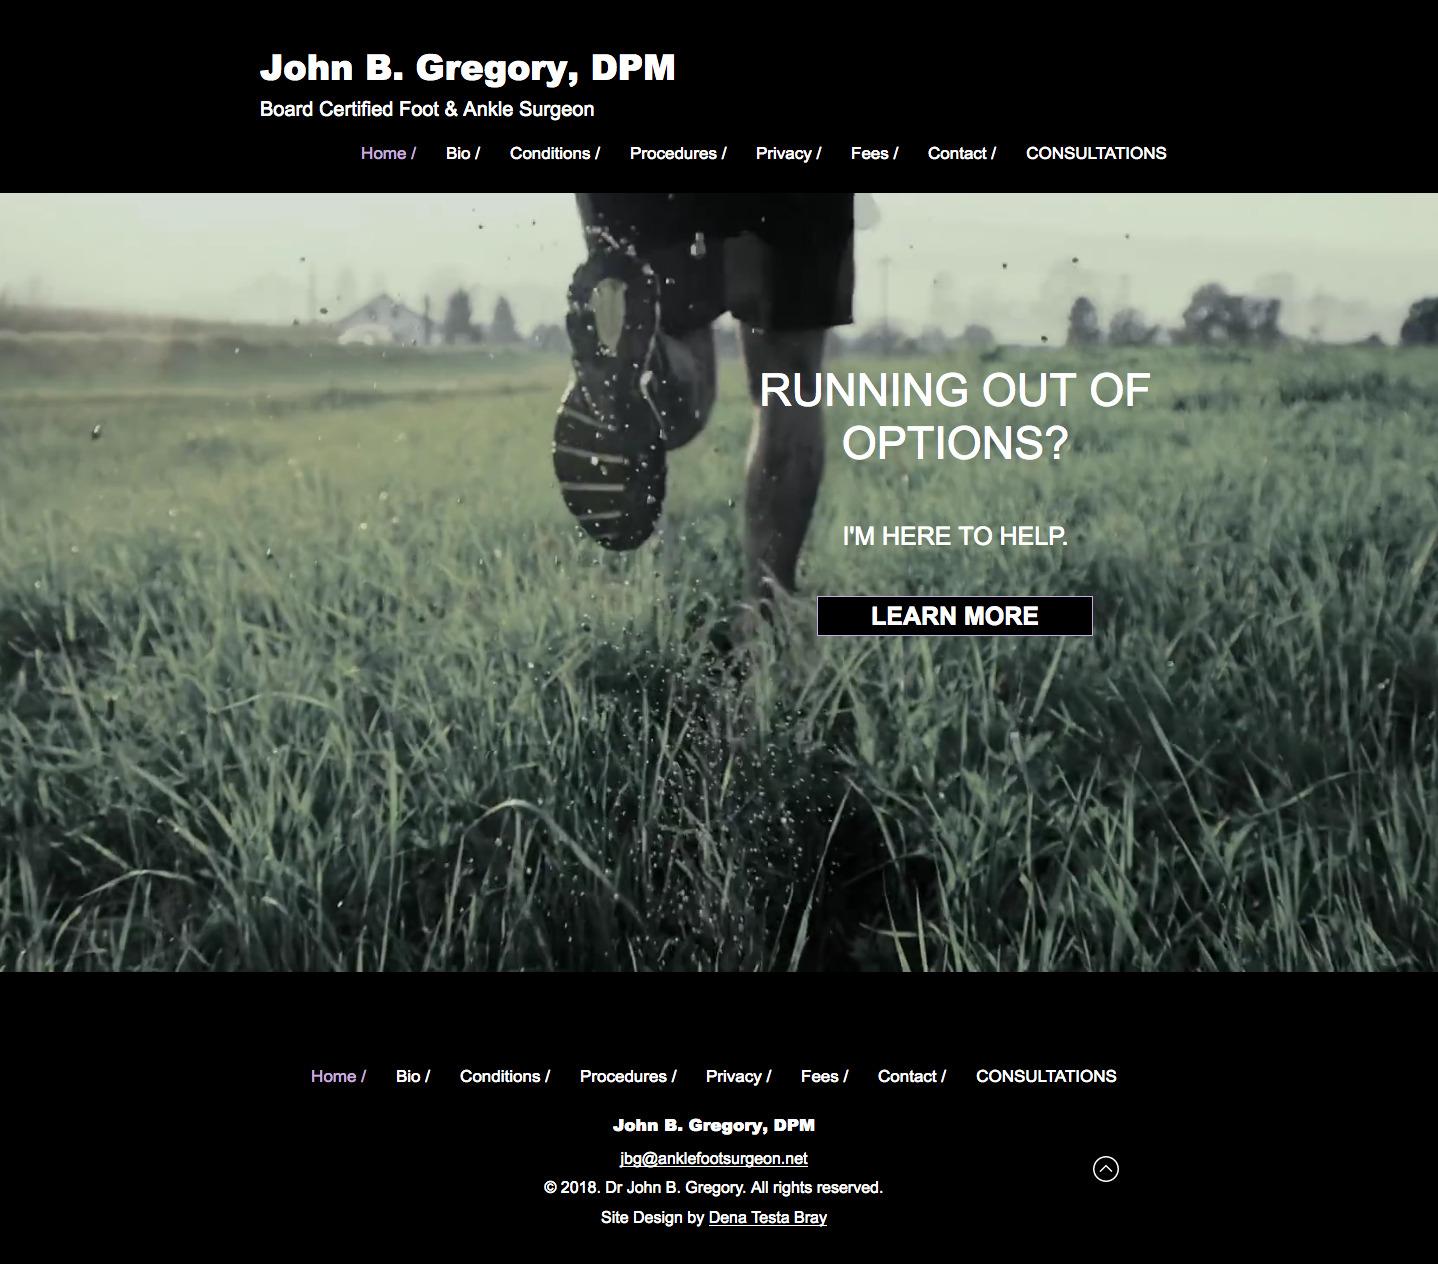 Dr. John Gregory